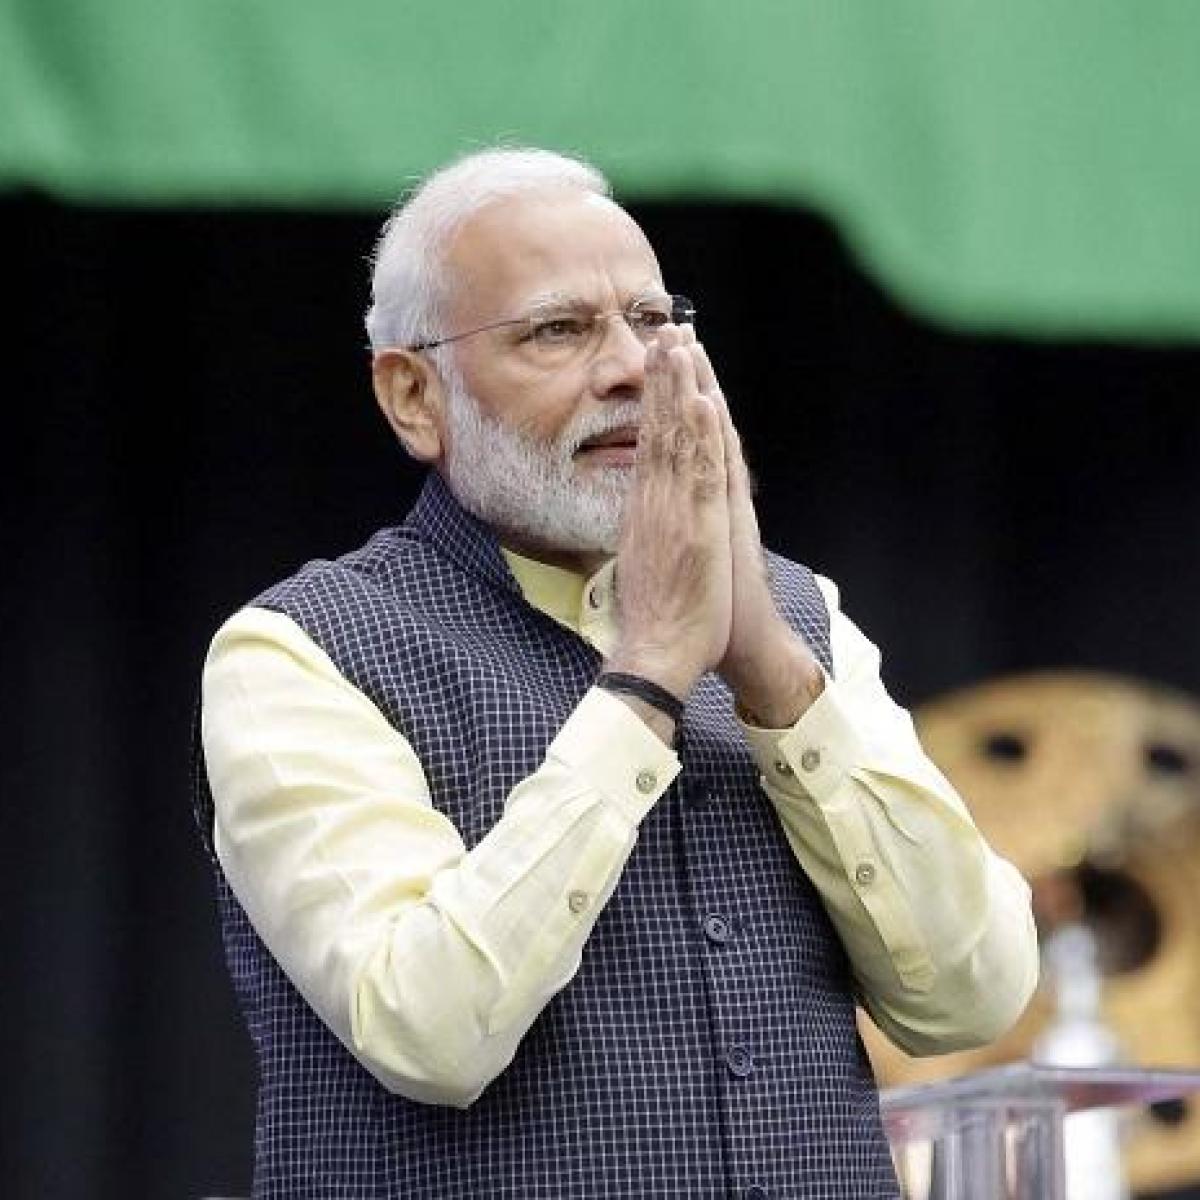 To mark PM Narendra Modi's birthday, BJP to organise 'Seva Saptah' next month